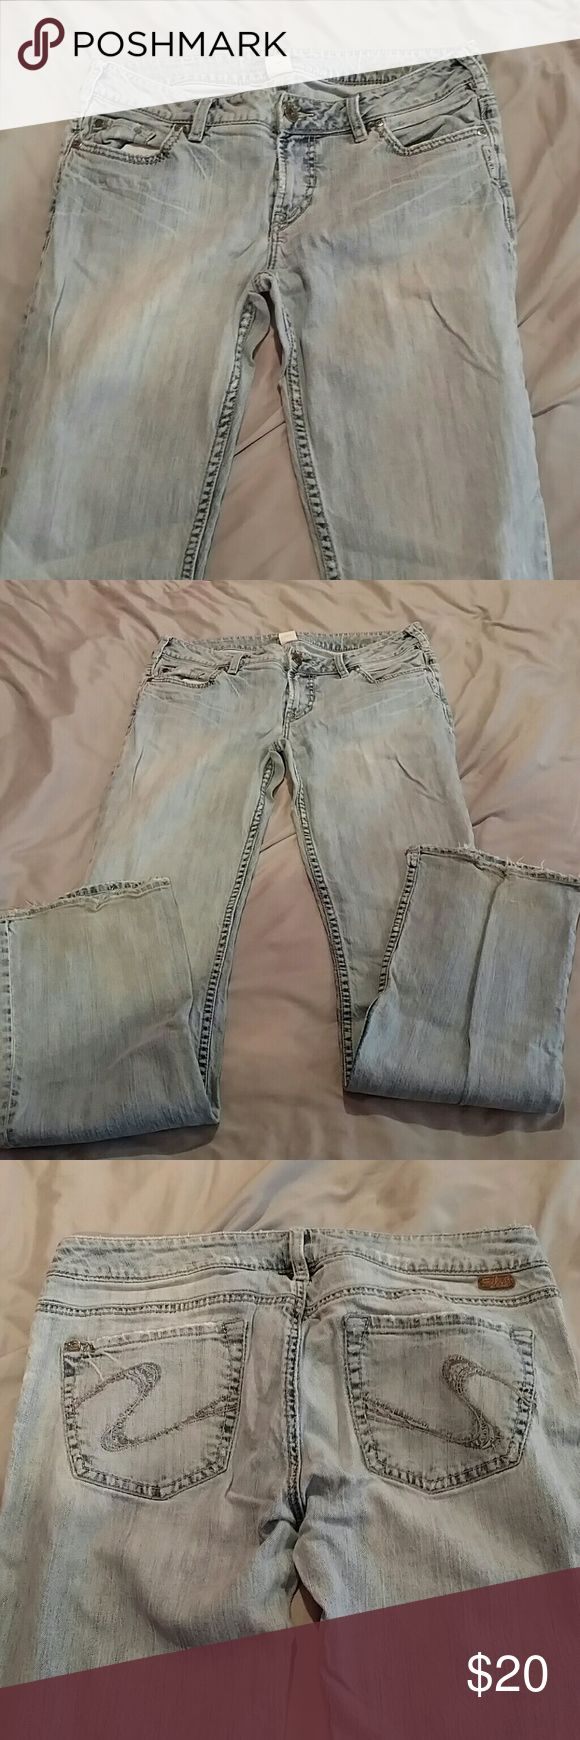 Silver Toni jeans Silver Toni jeans. Silver Jeans Jeans Boot Cut